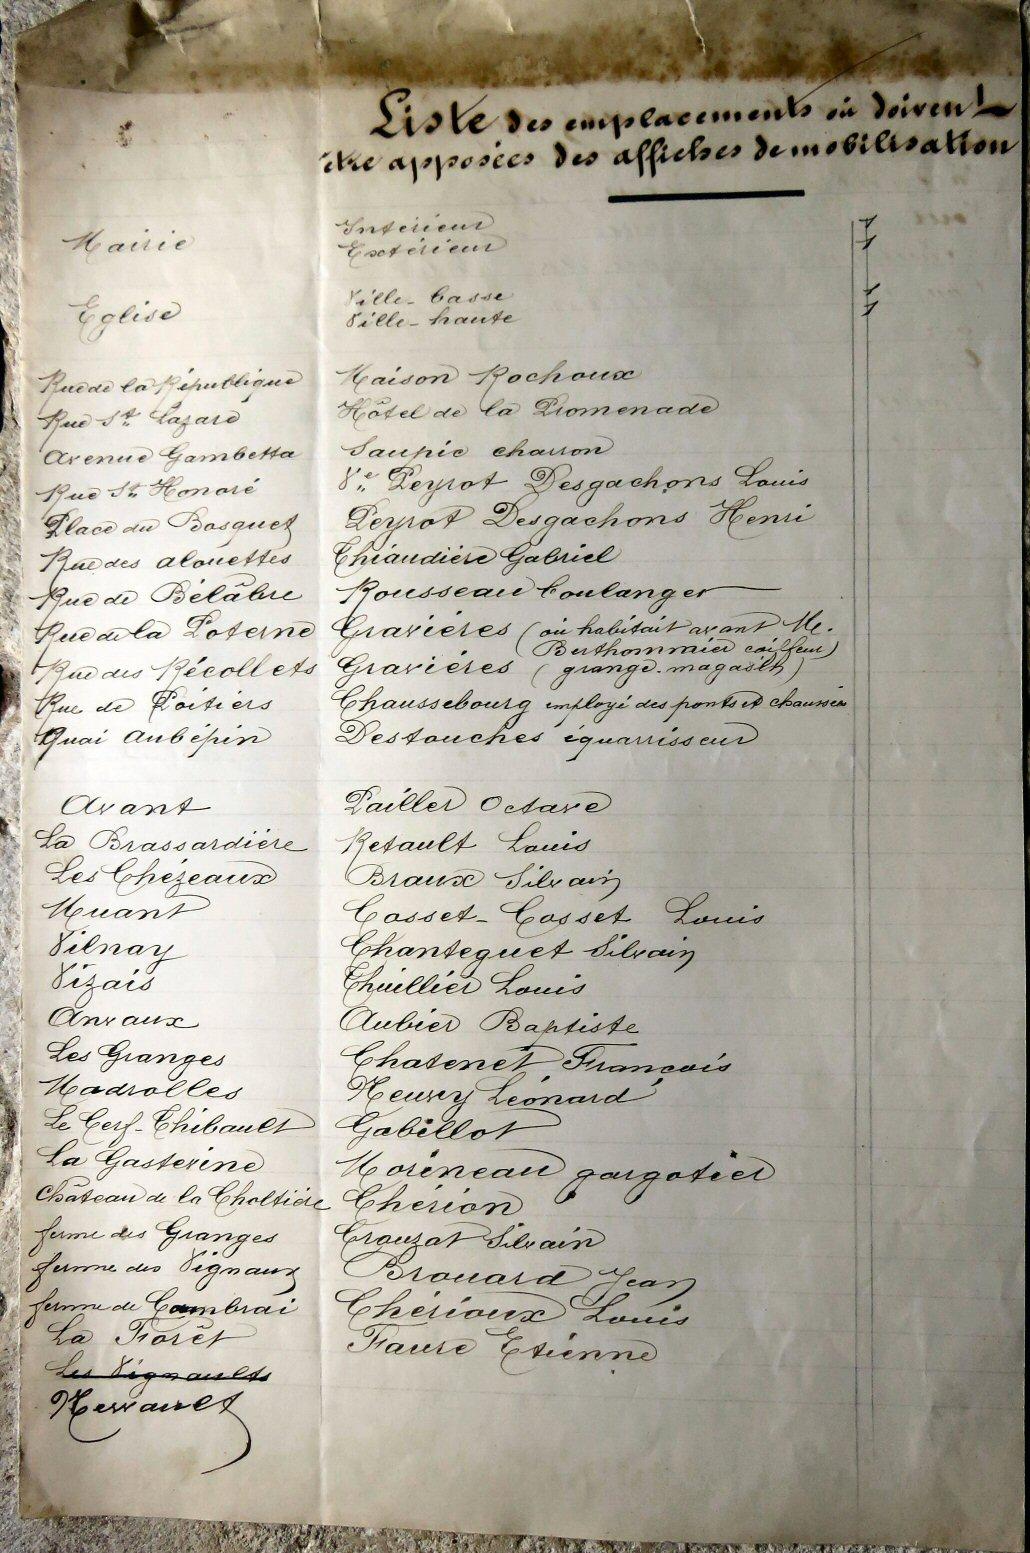 Liste affichage recto